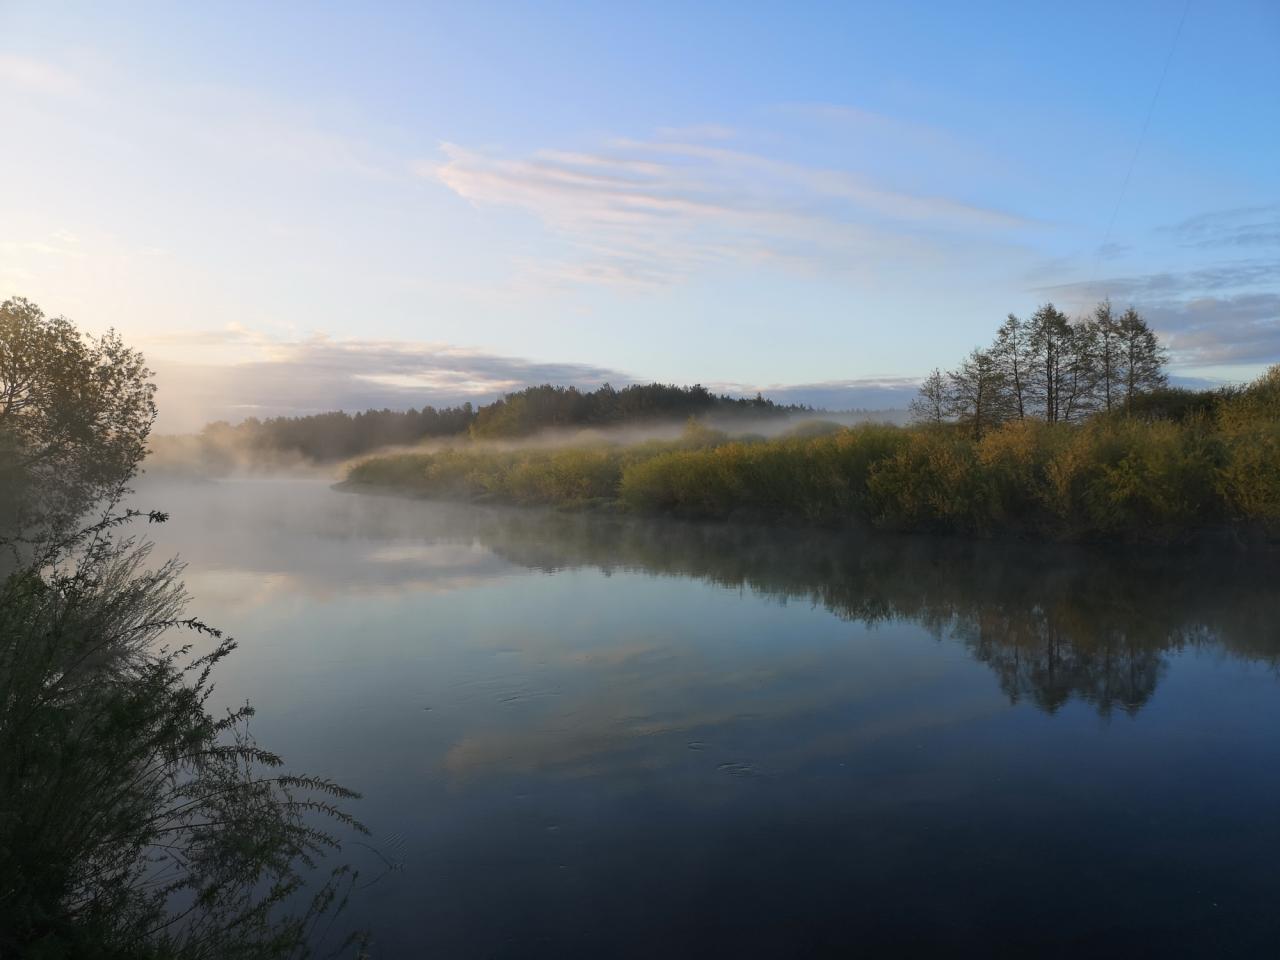 Рыбалка на 6-9 мая у меня была запланирована ... | Отчеты о рыбалке в Беларуси